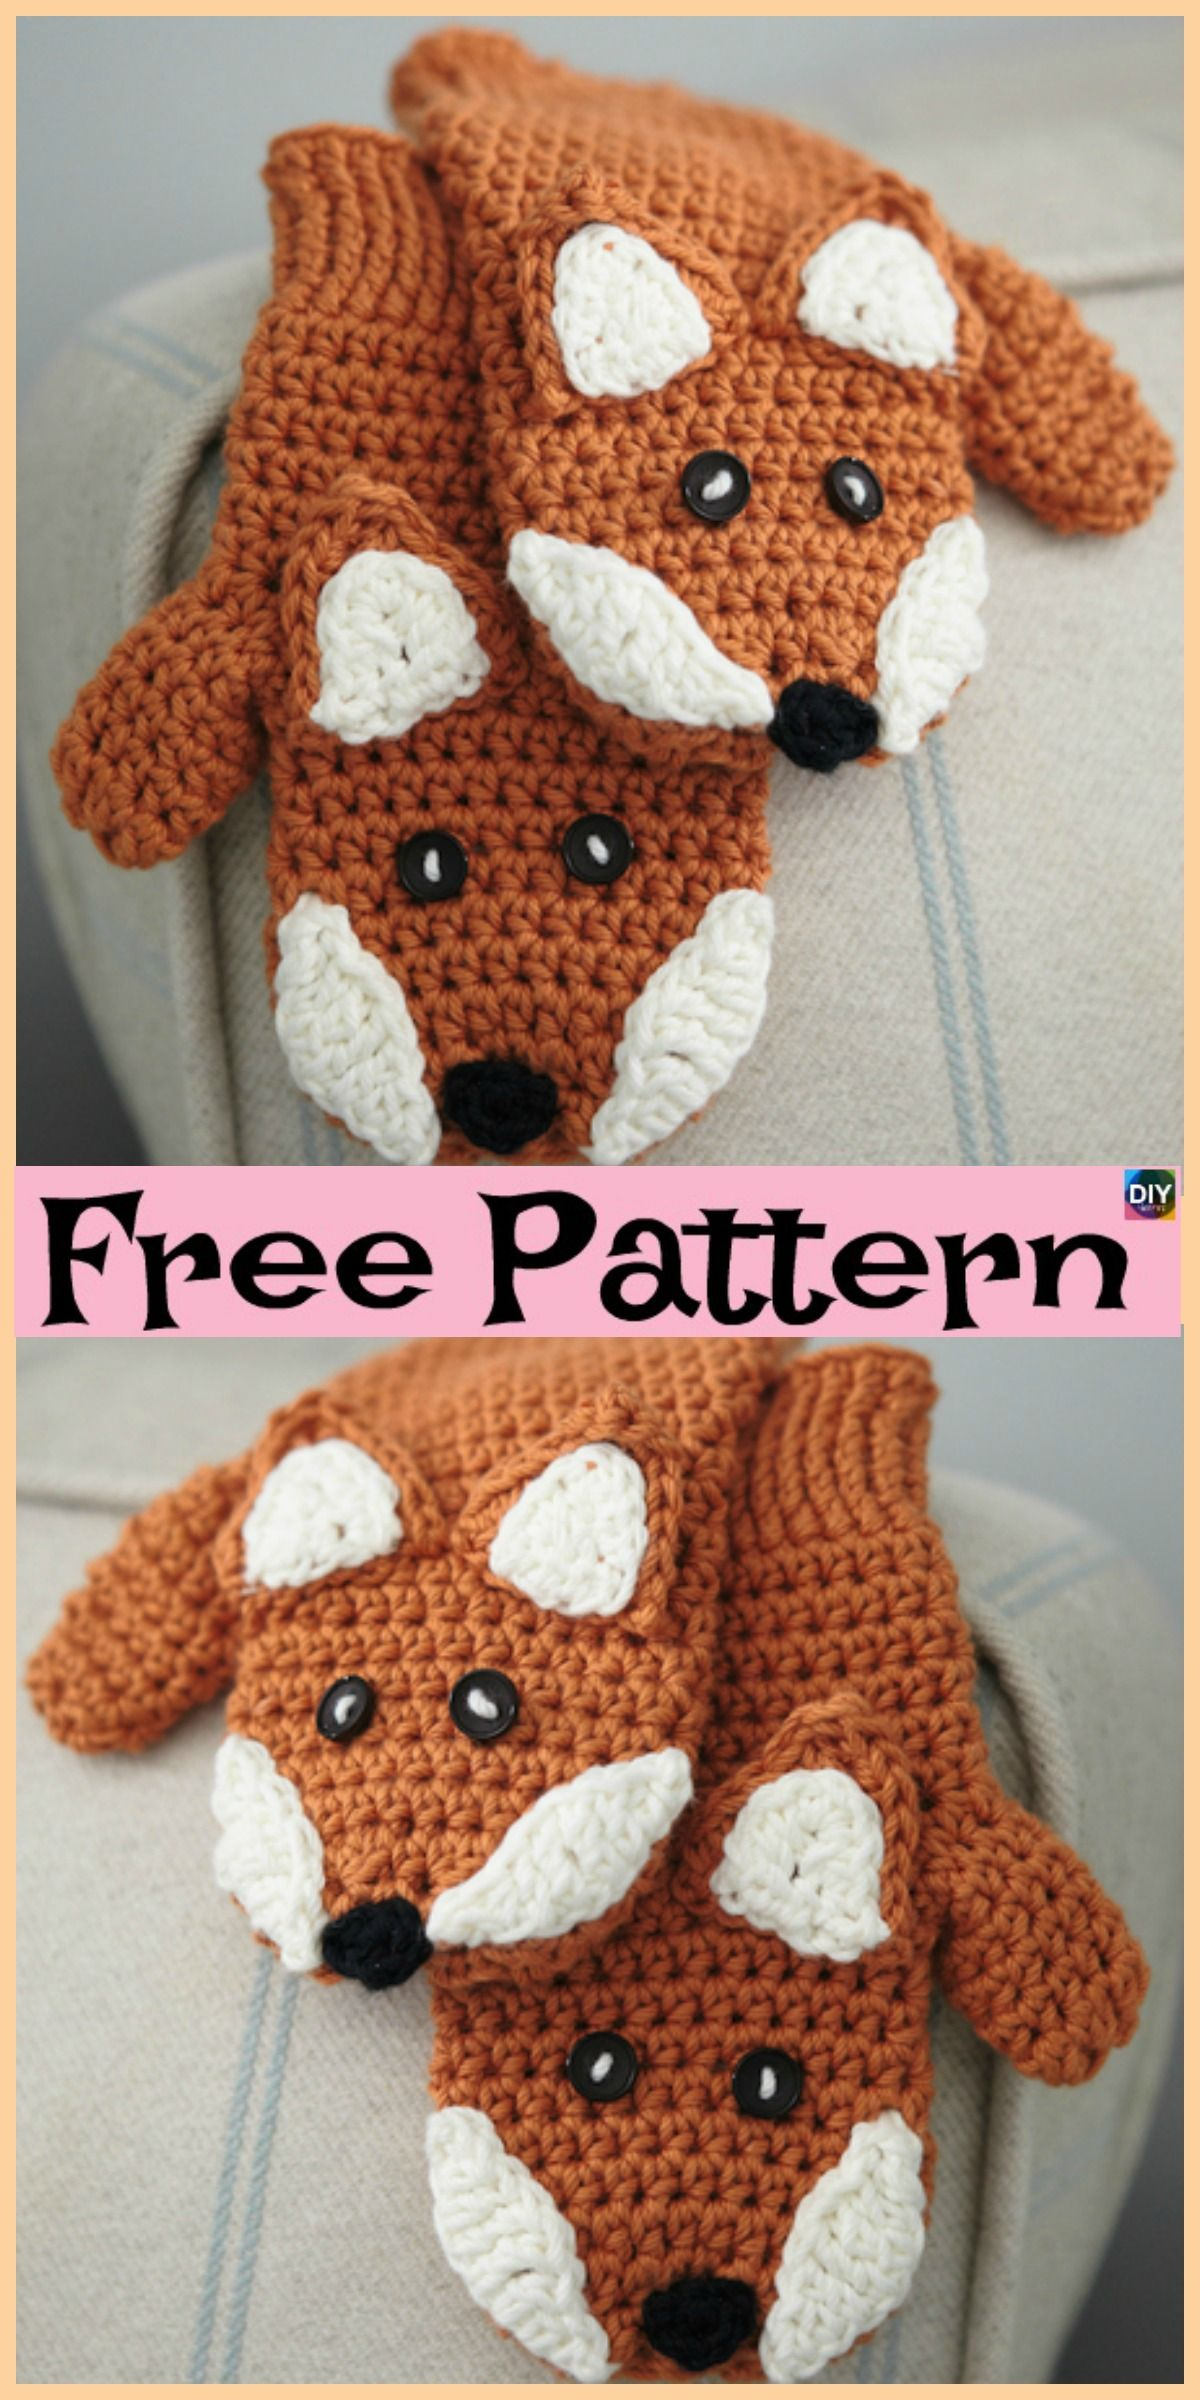 Knit Crochet Fox Mittens Free Patterns Crochet Hats u Gloves